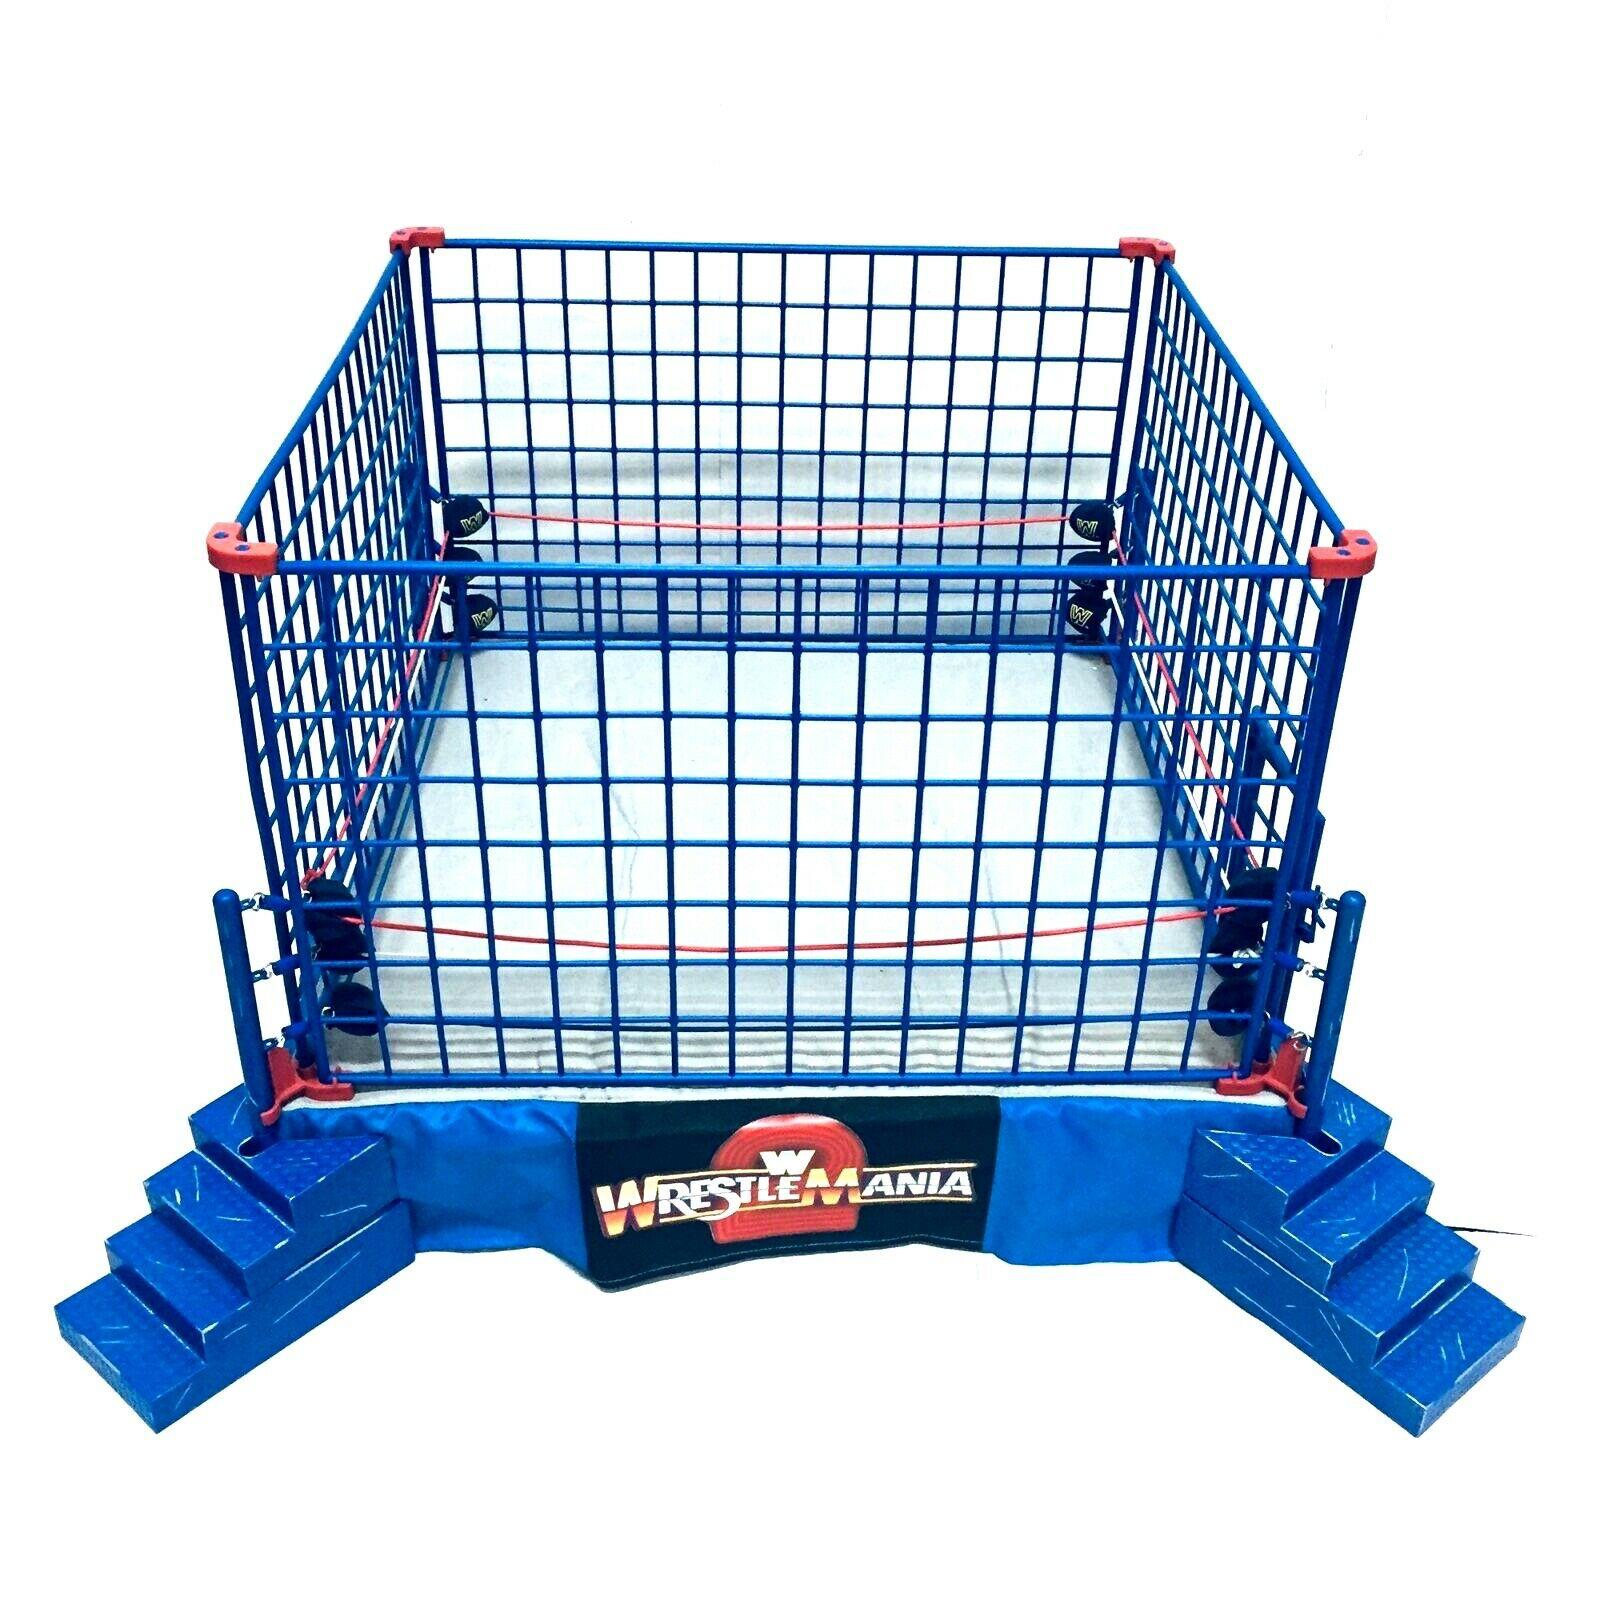 Wwe Jakks Pacific Wrestlemania 2 Official Scale Ring Steal Cage Wrestling Set Wrestlemania Wwe Wrestling